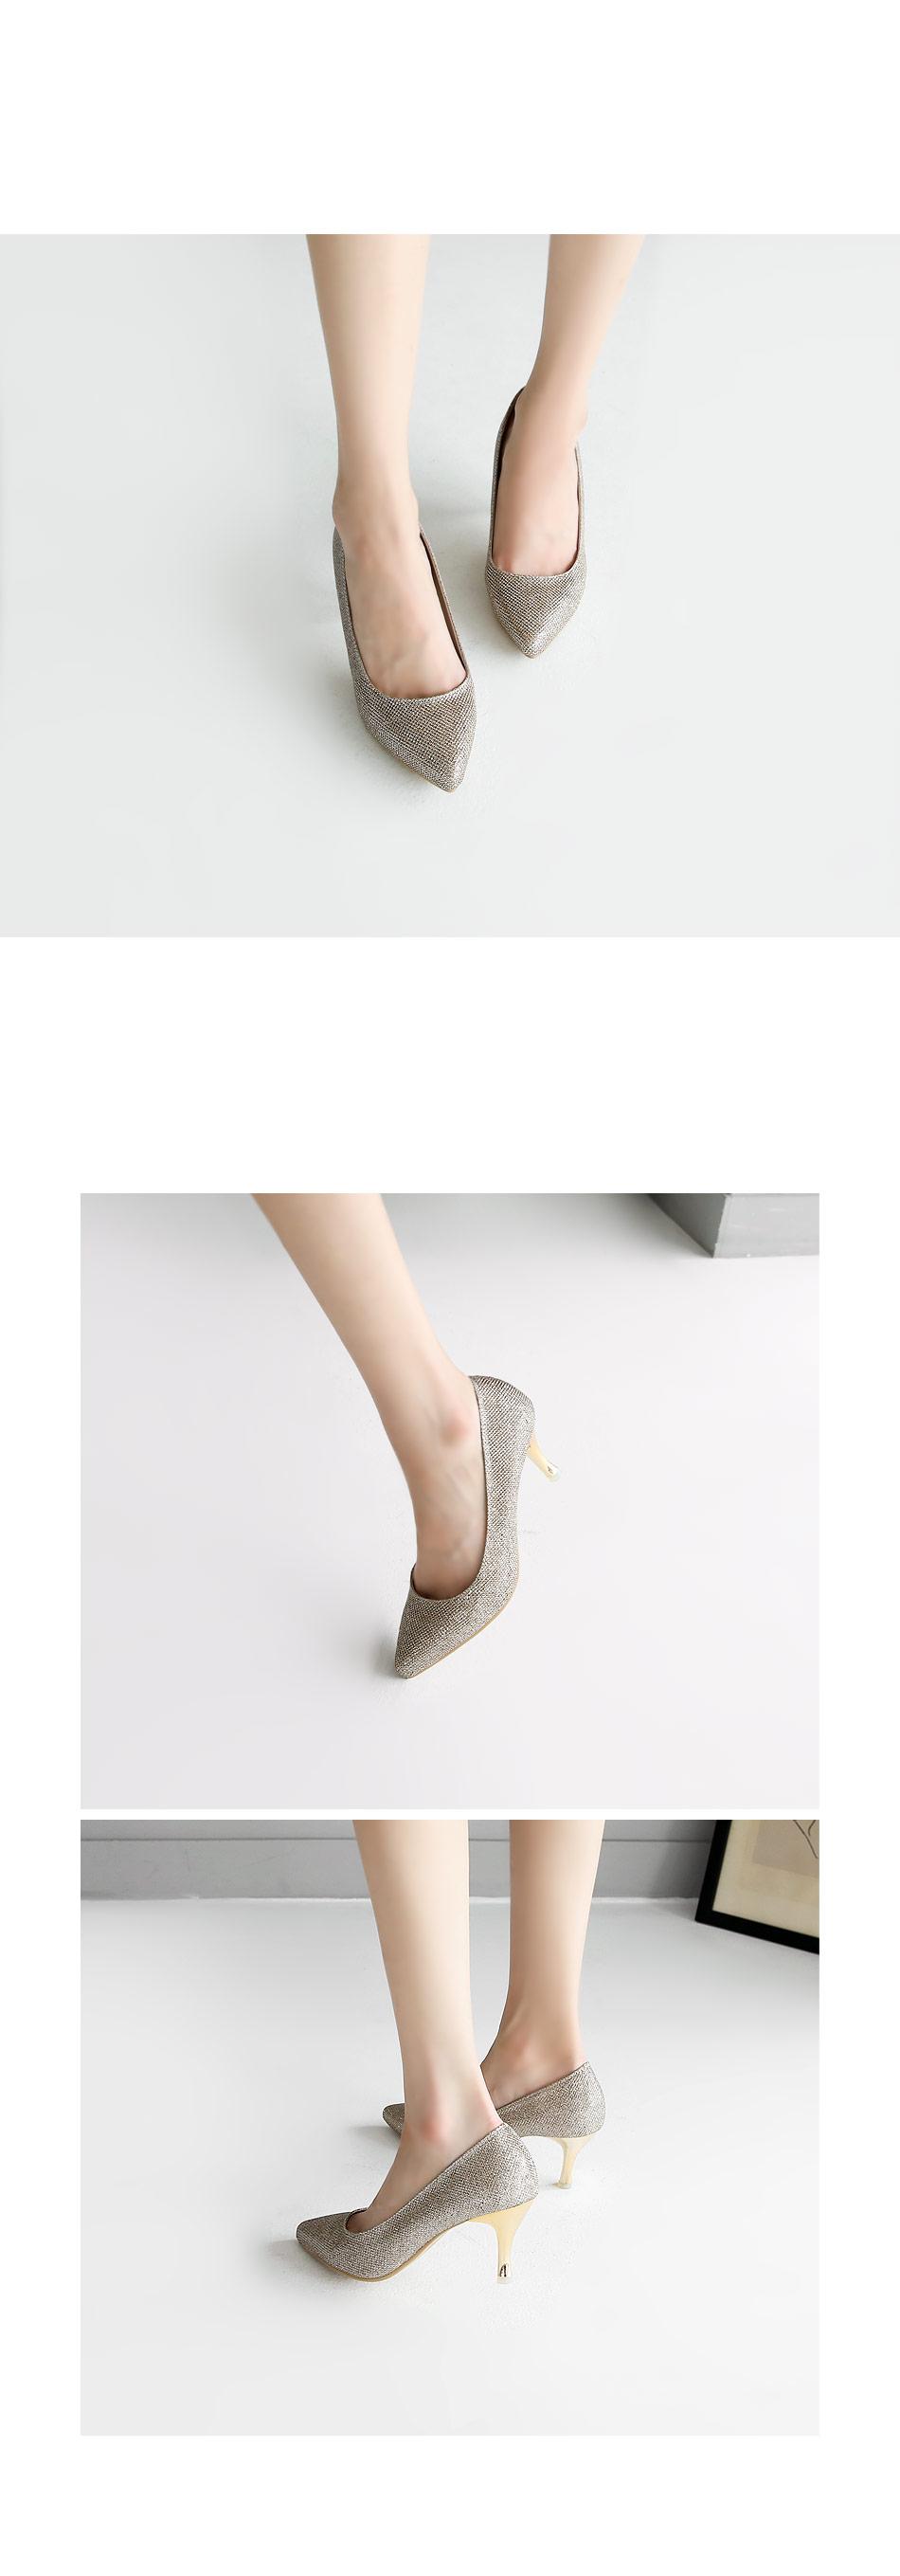 Etlin stiletto high heels 7 cm